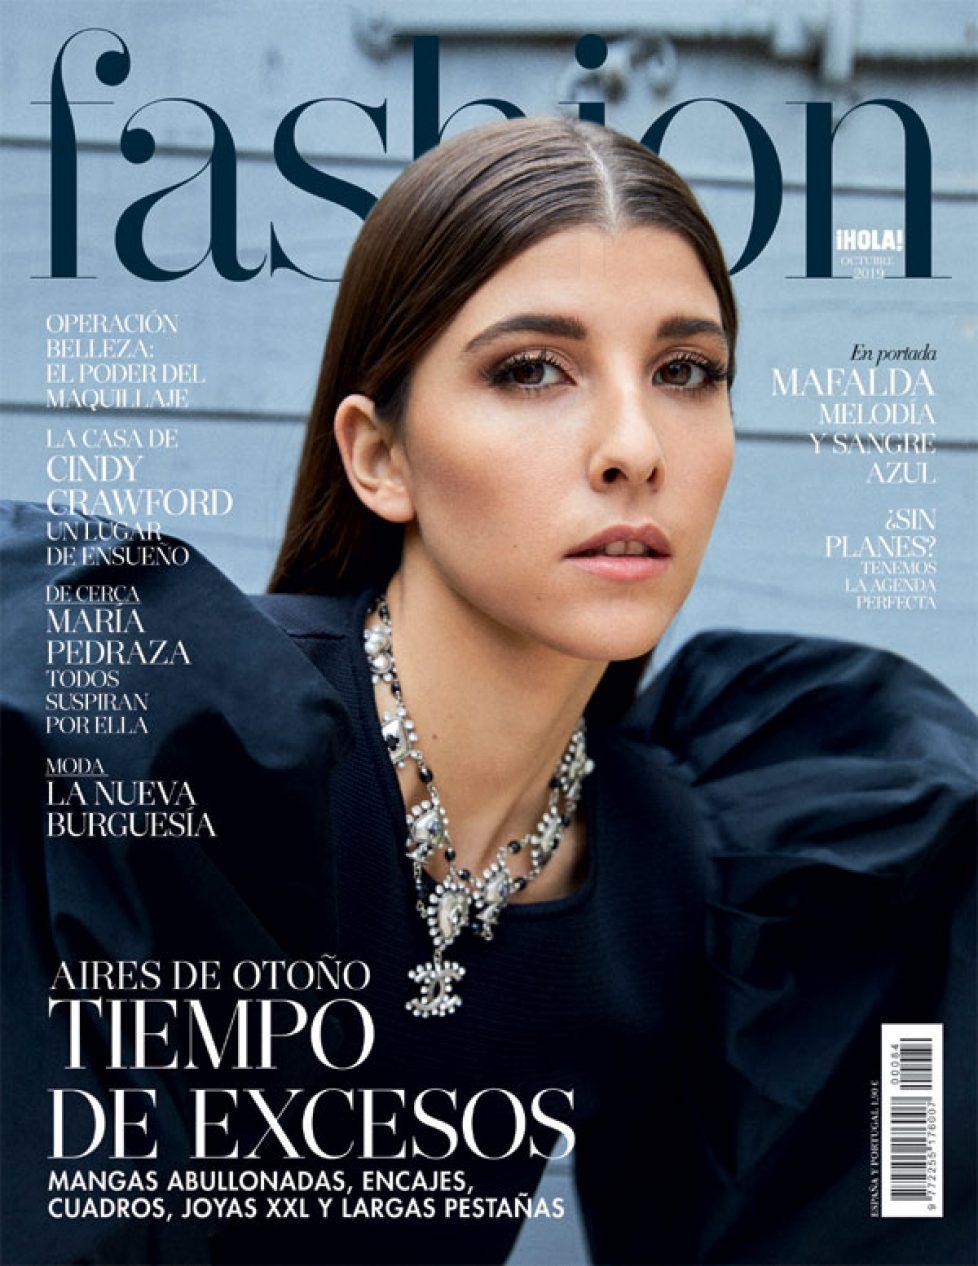 mafalda-fashion-z